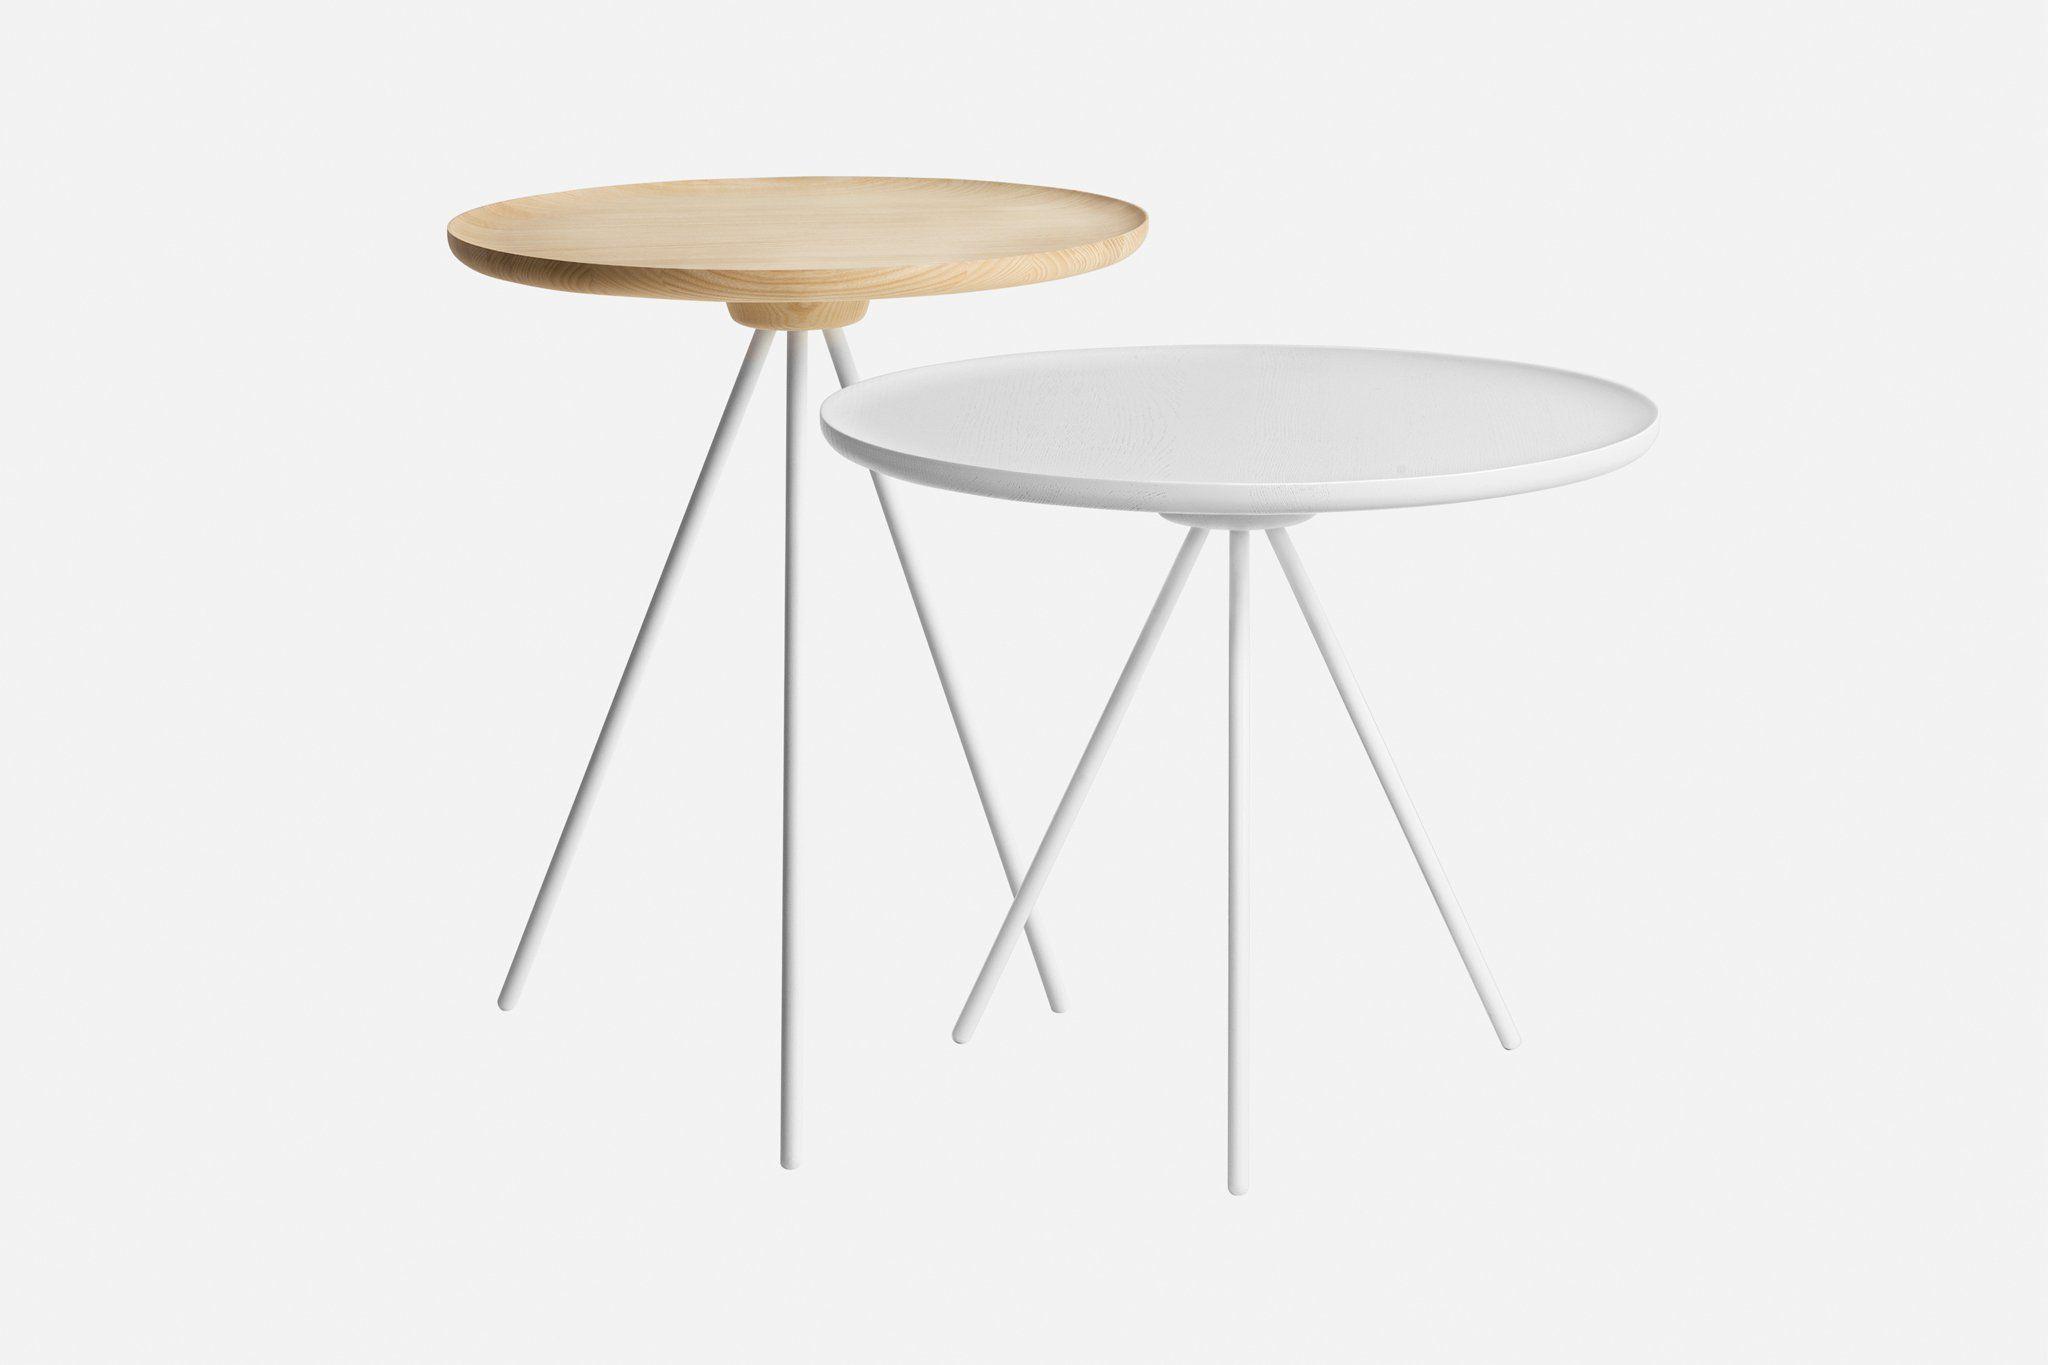 Key Coffee Side Table Set In 2021 Side Table Coffee Table Scandinavian Coffee Table [ 1365 x 2048 Pixel ]